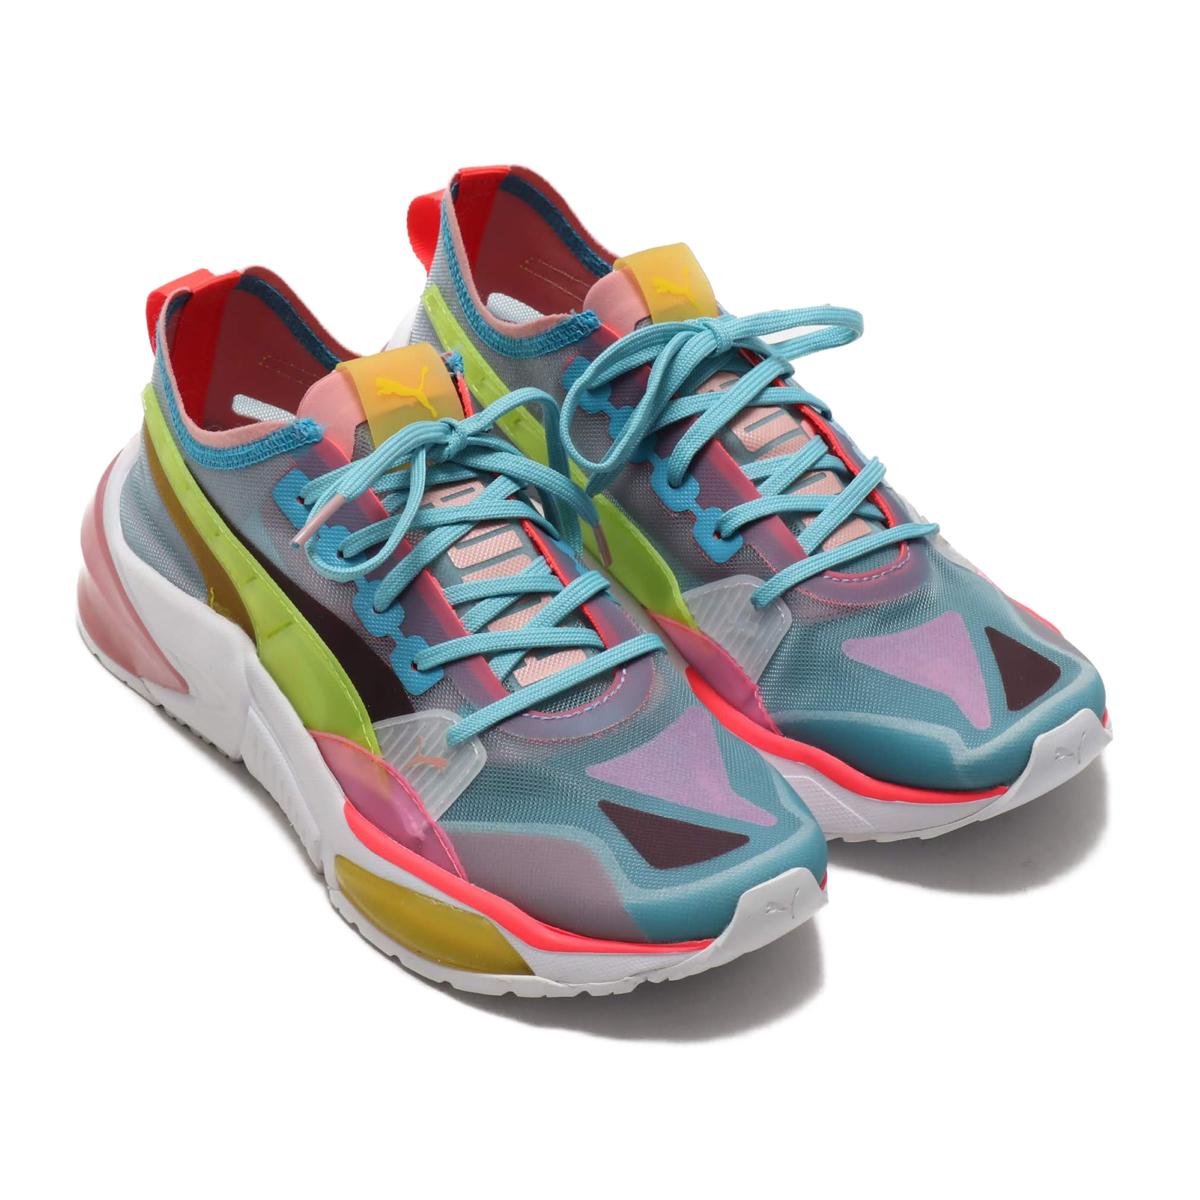 Puma-LQDCELL-Optic-Sheer... +80 Most Inspiring Workout Shoes Ideas for Women